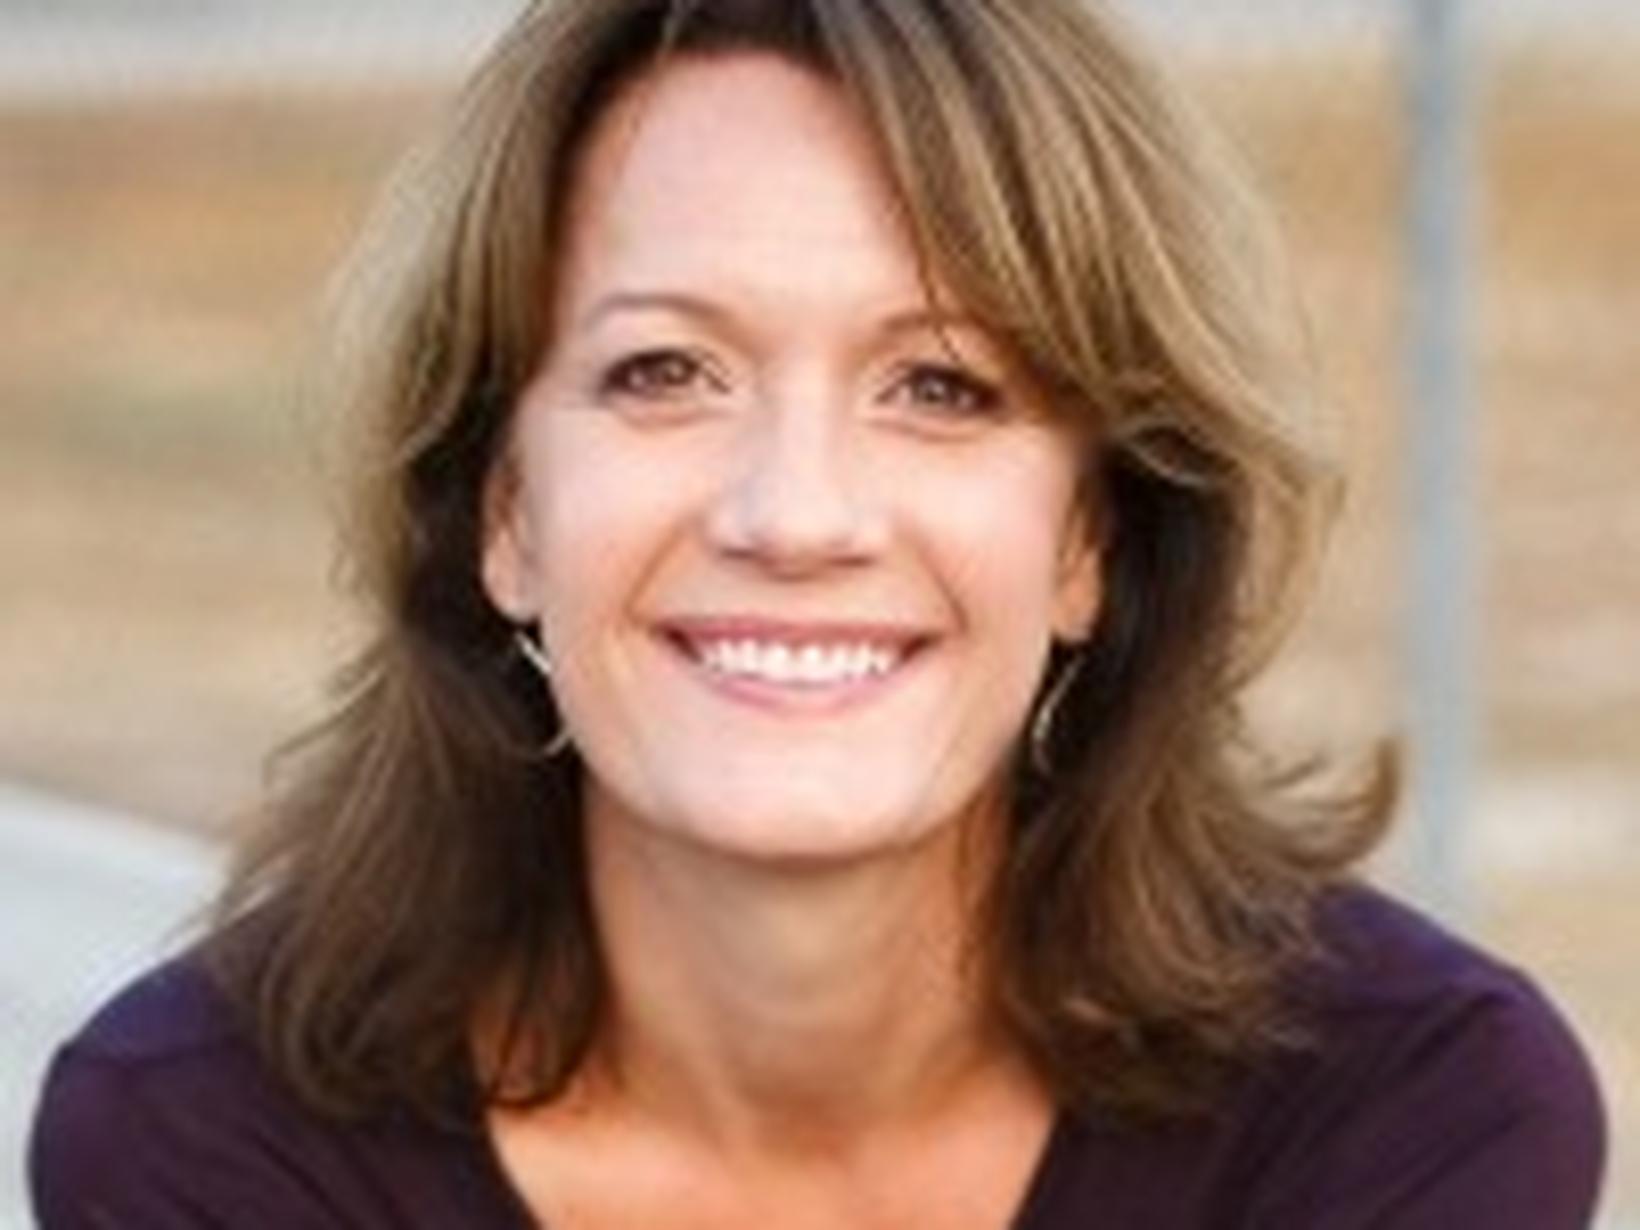 Jeanie from Seattle, Washington, United States